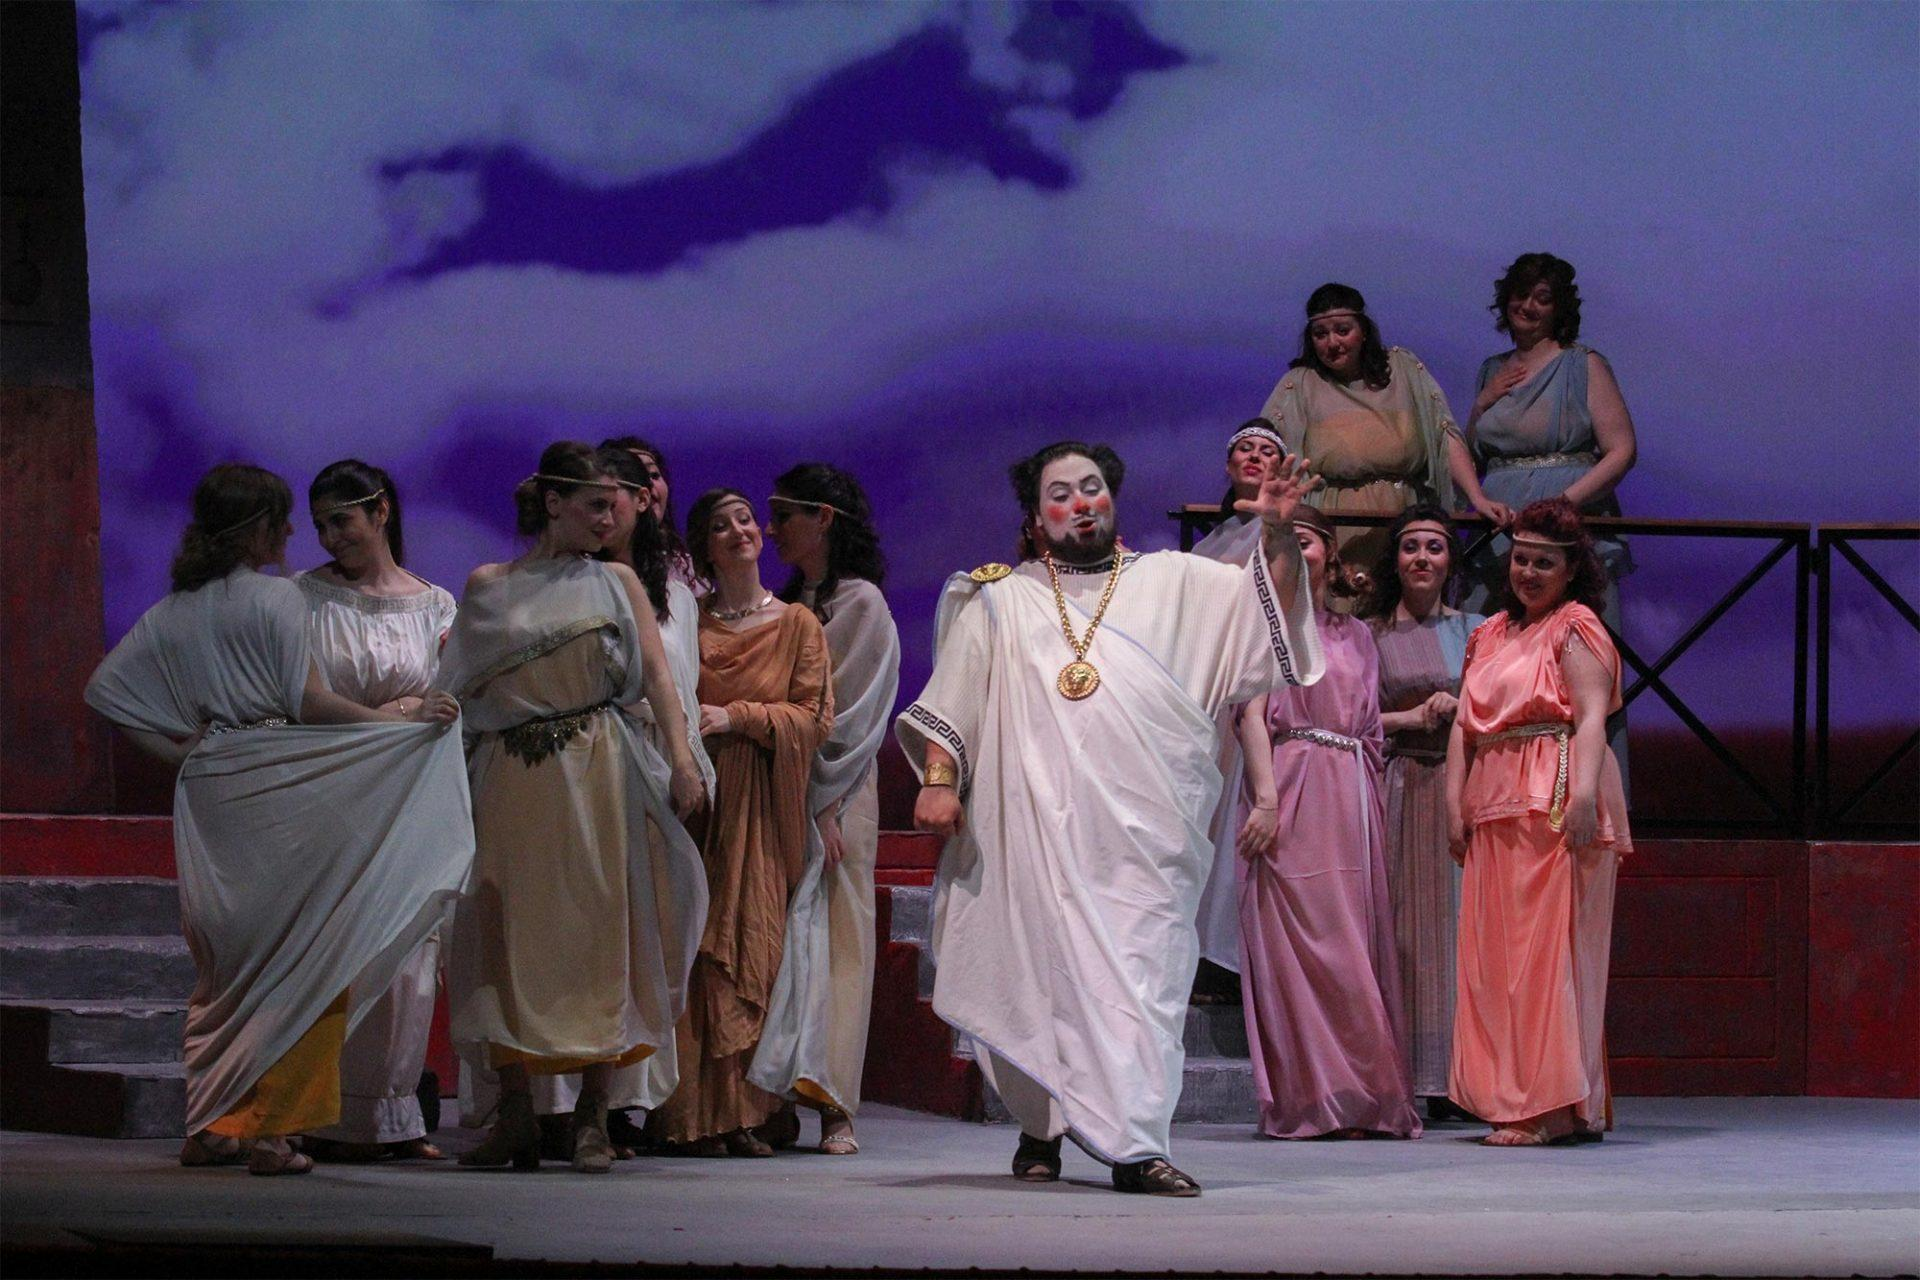 teatro-marrucino-giove-a-pompei-04